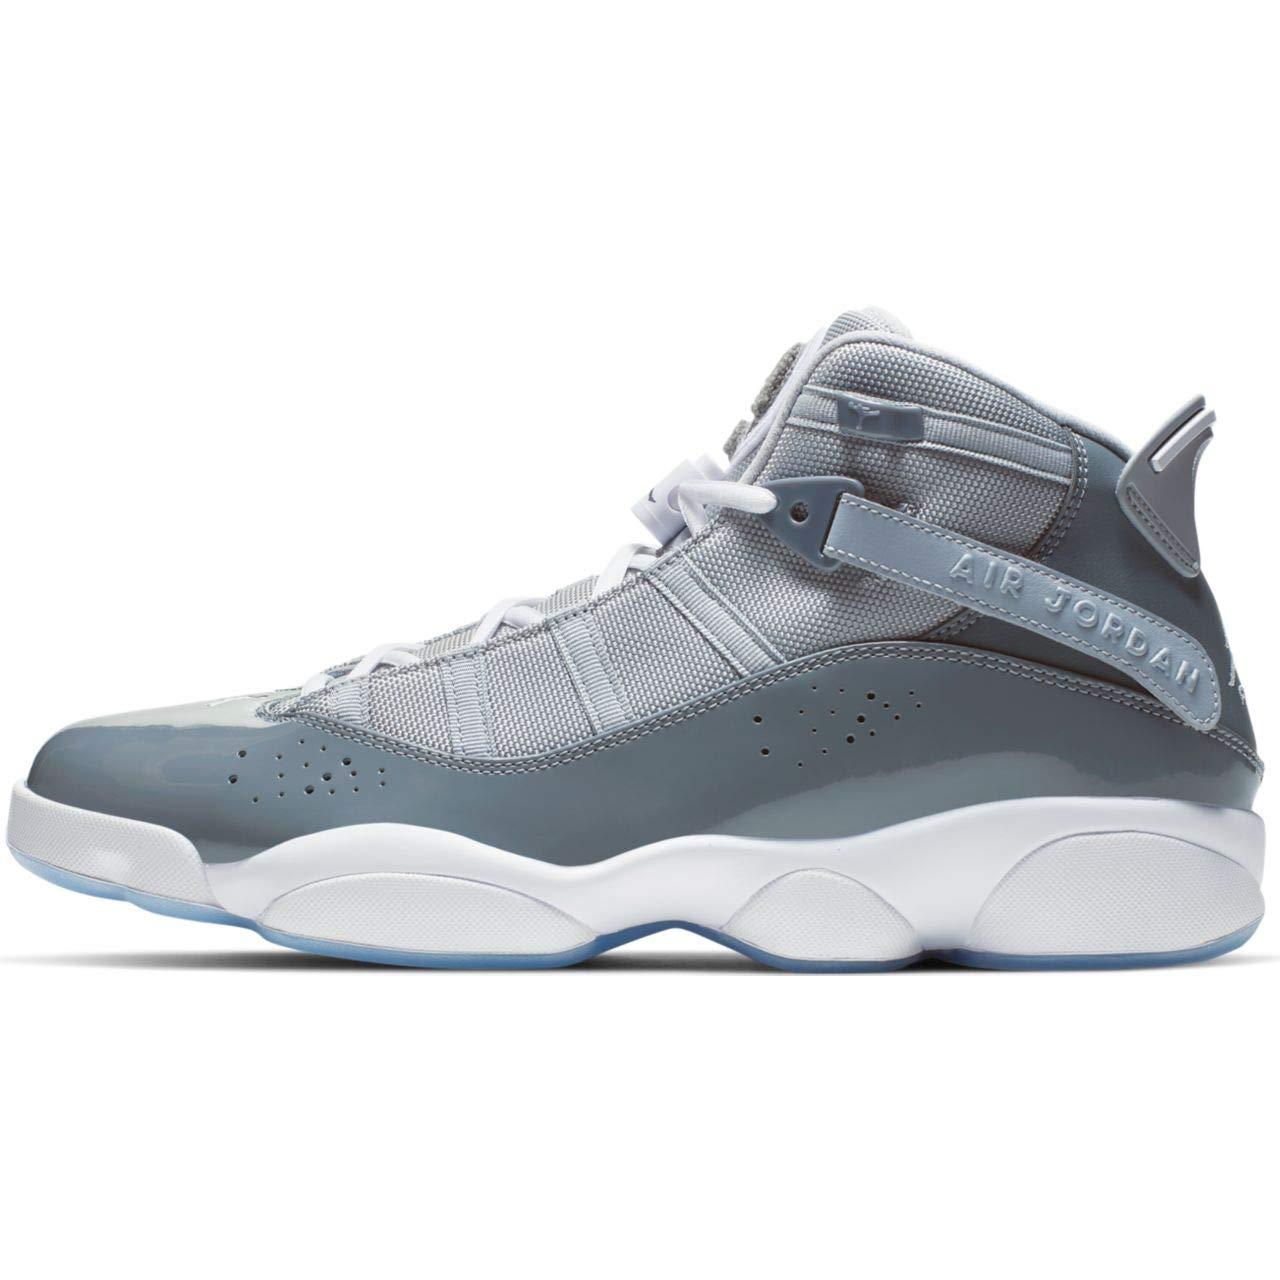 new arrival 0d7bf 2c25c Amazon.com | Nike Jordan 6 Rings Mens 322992-015 | Basketball